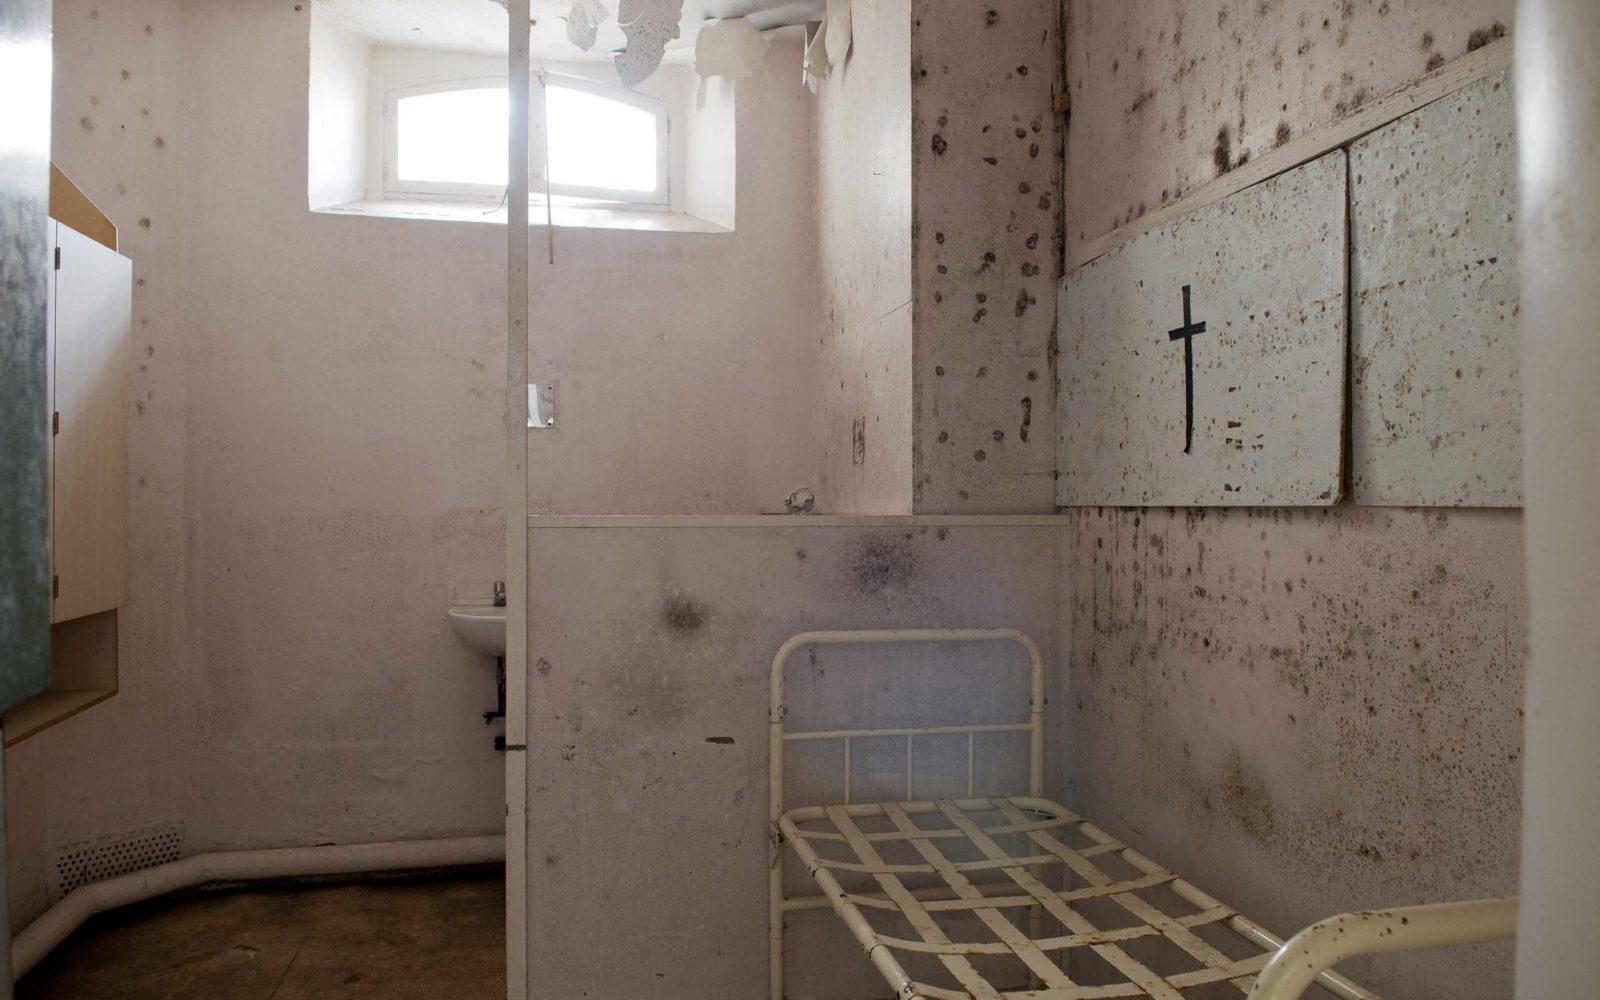 Shepton Mallet Prison Tours